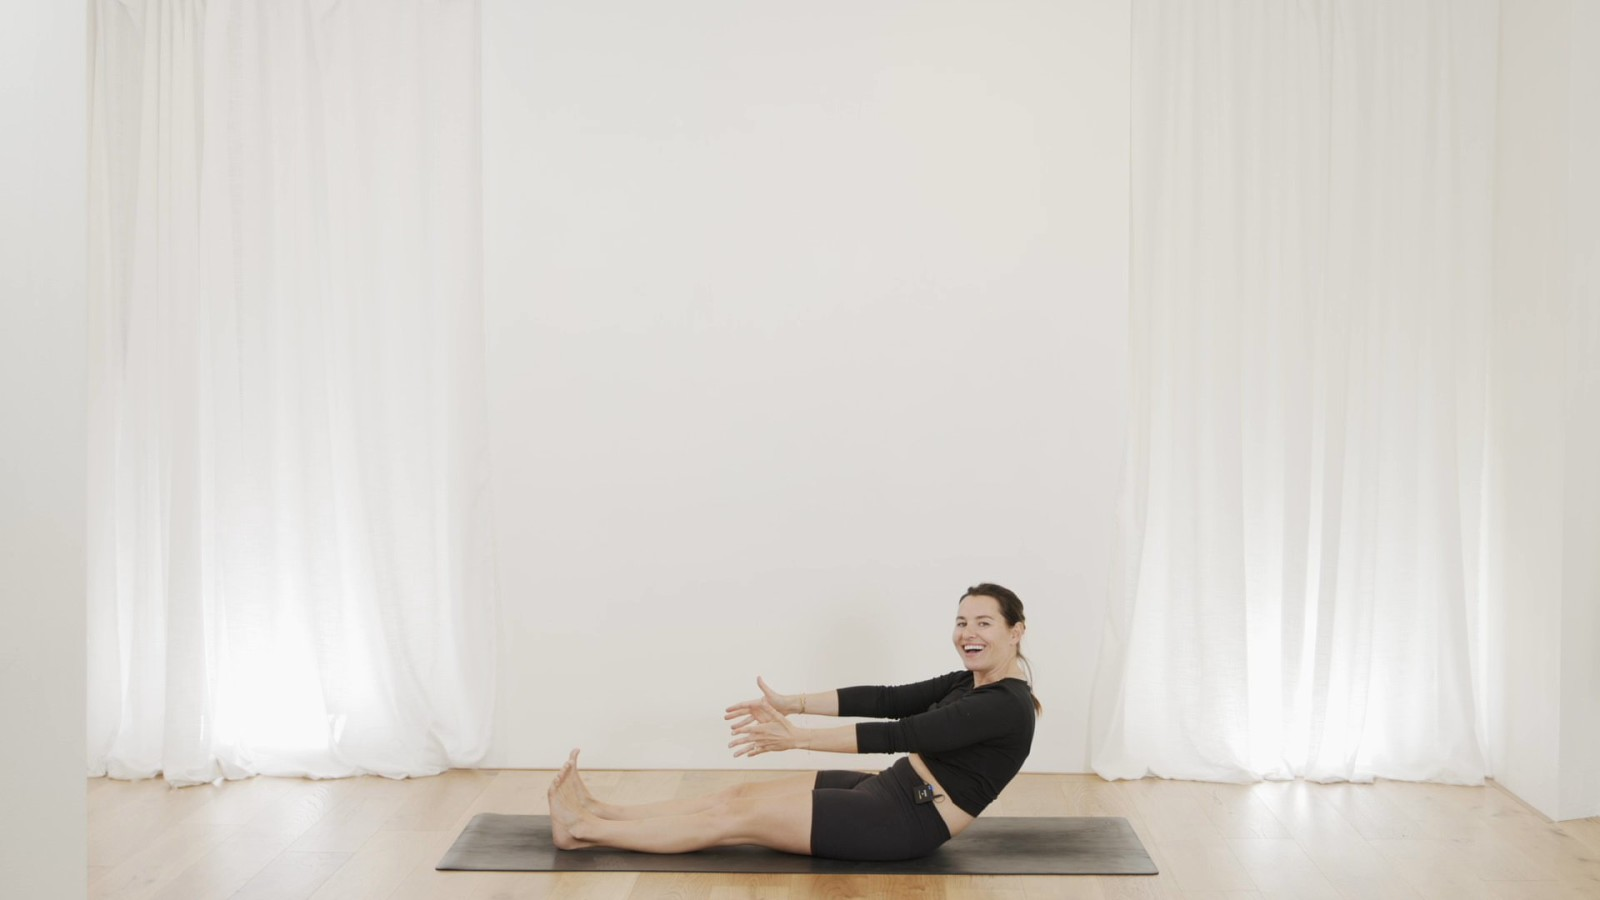 Day 5 Core Challenge 5 of 5 with Aneta Bachanova